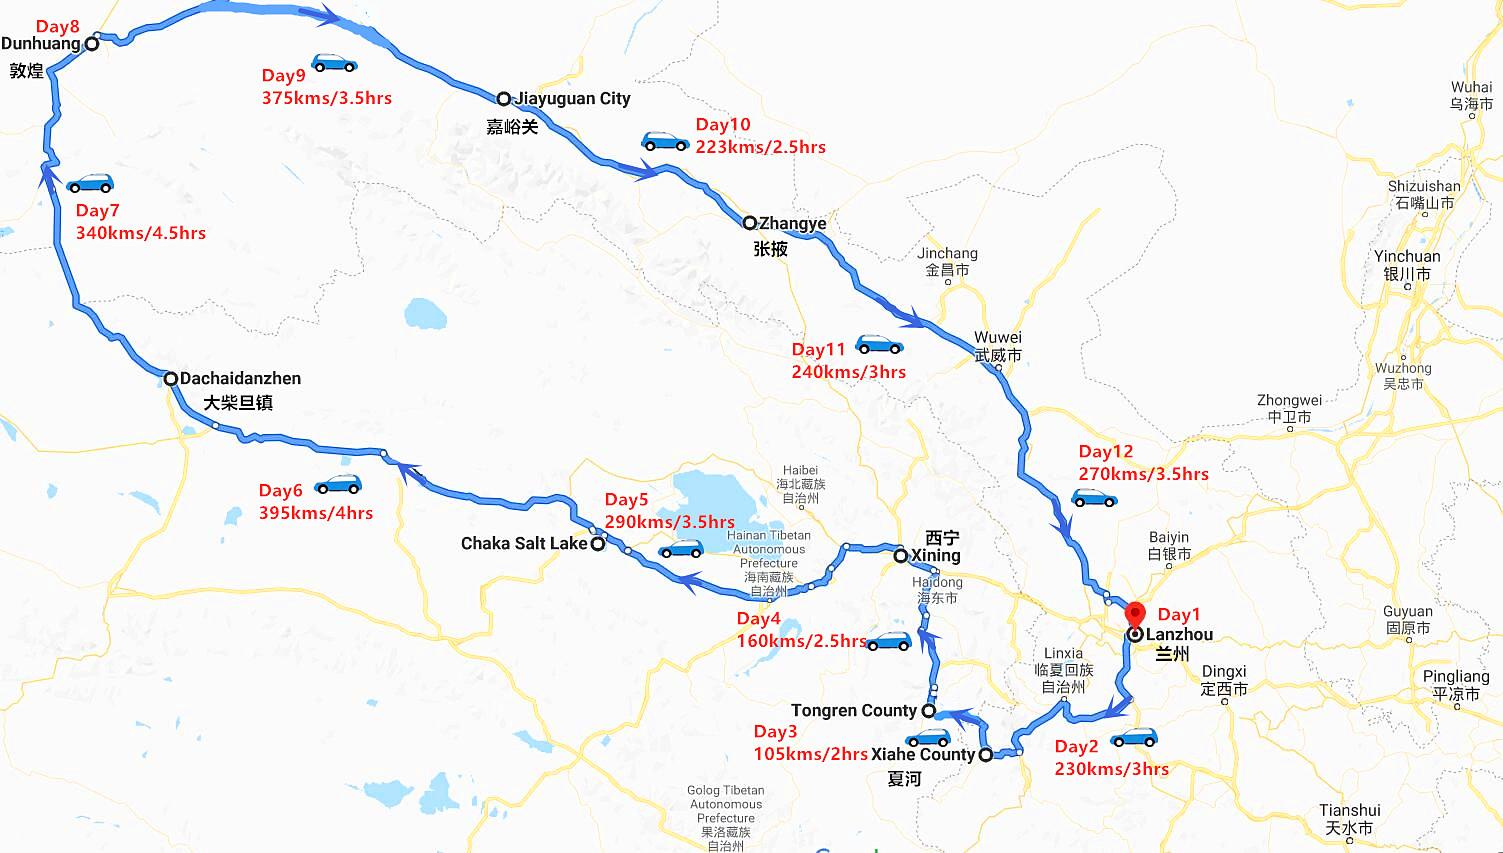 11 Days Qinghai Gansu Tour Travel Map